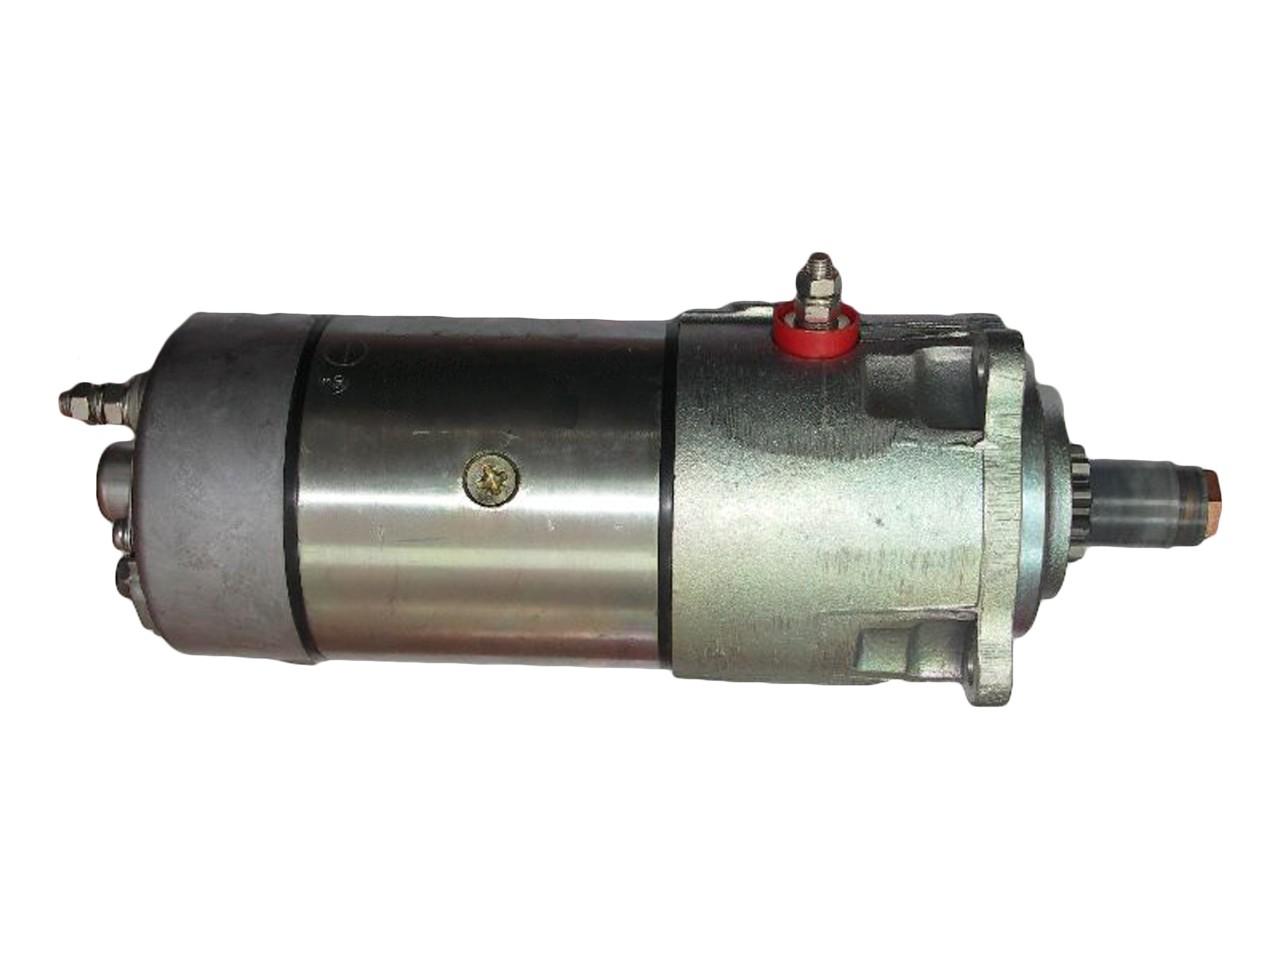 New hi torque starter motor perkins engine 1006 6 5977cc 6 for Hi torque starter motor